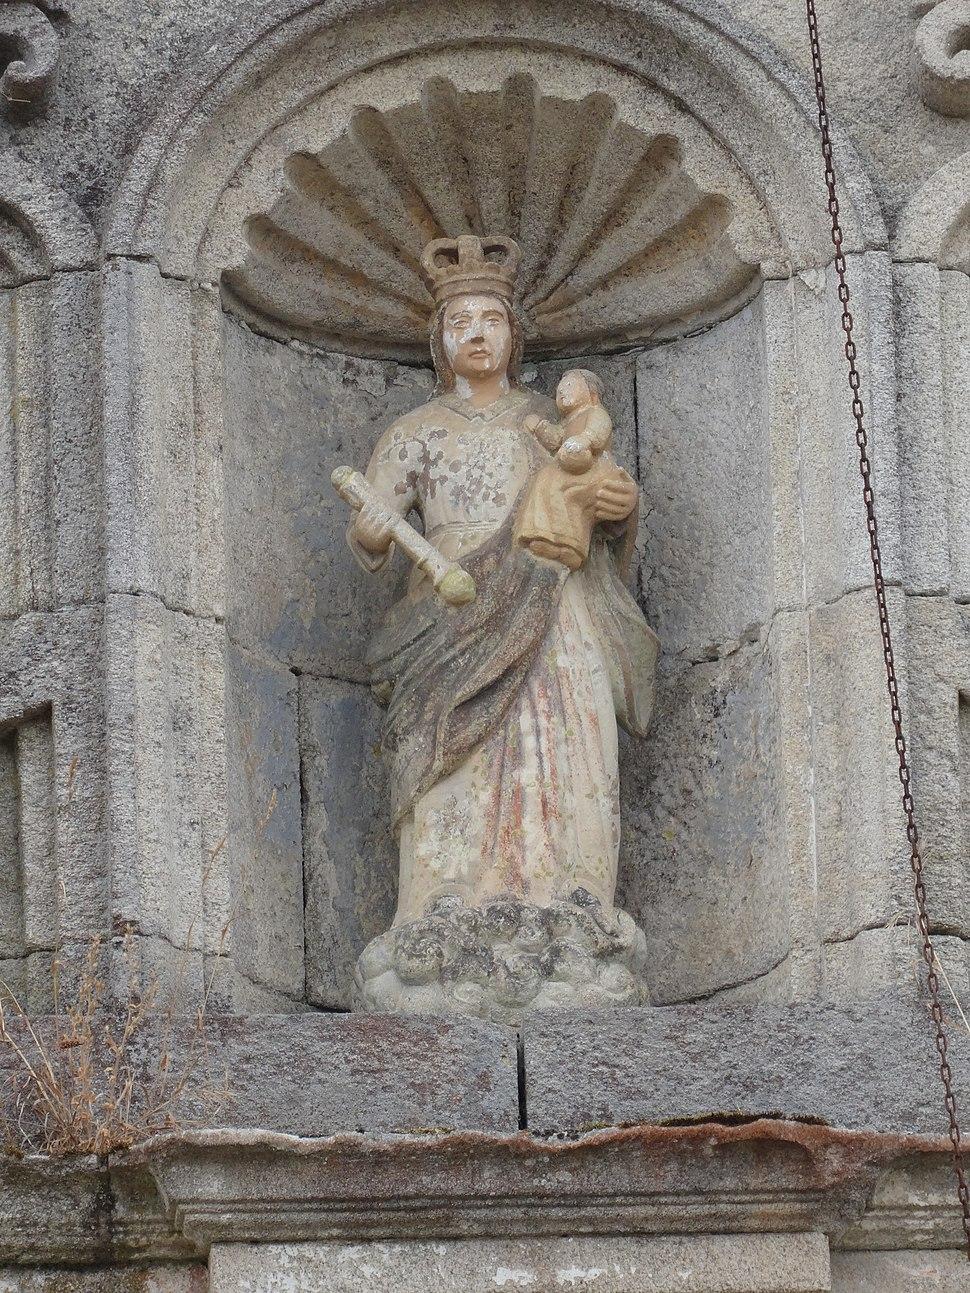 Escultura fachada igrexa Grixoa, San Amaro